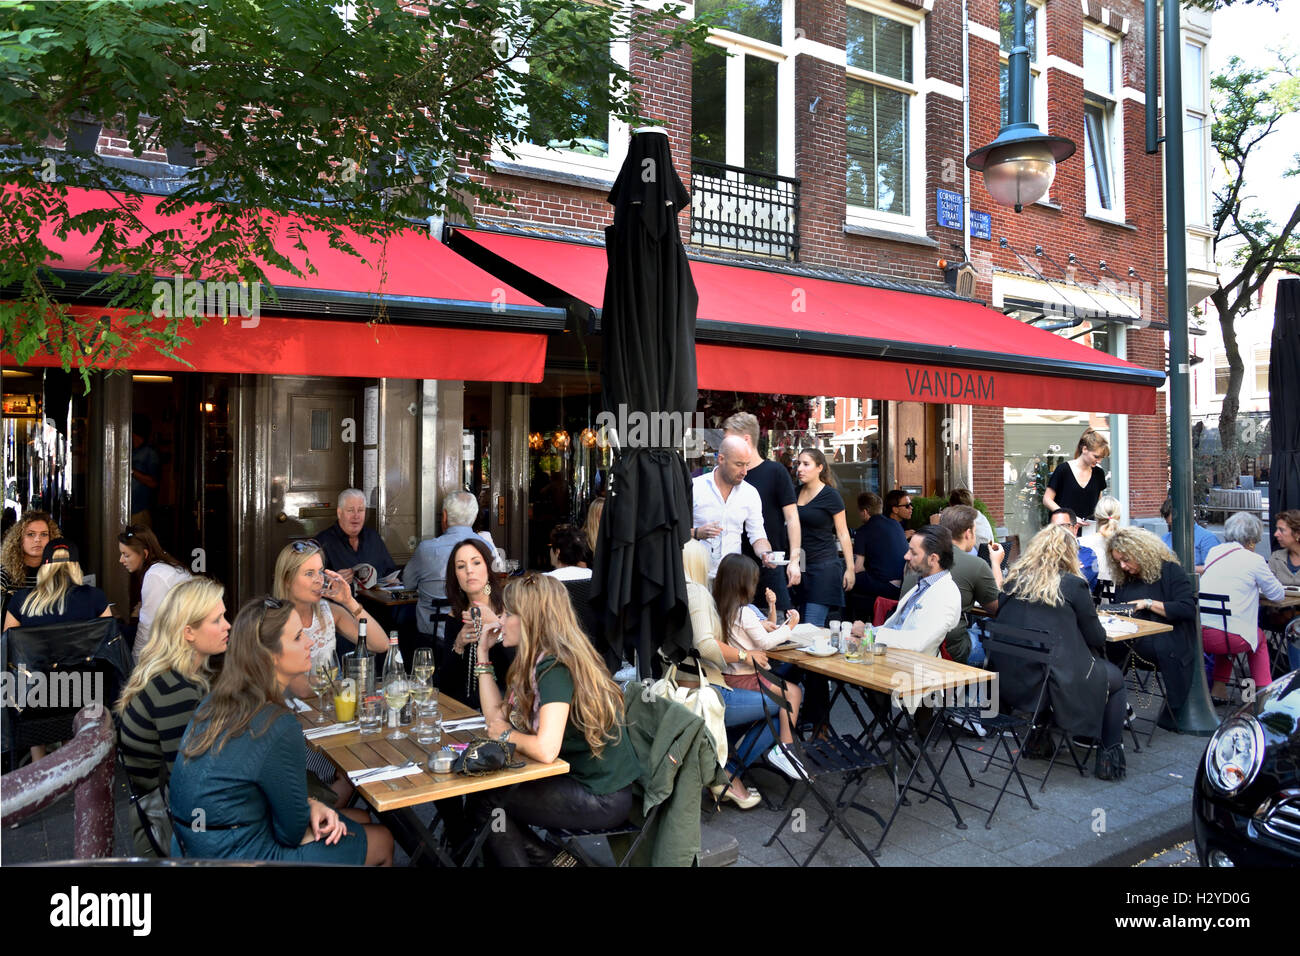 French restaurant Brasserie Van Dam Cornelis Schuytstraat  Oud Zuid Amsterdam   Dutch Netherlands Stock Photo